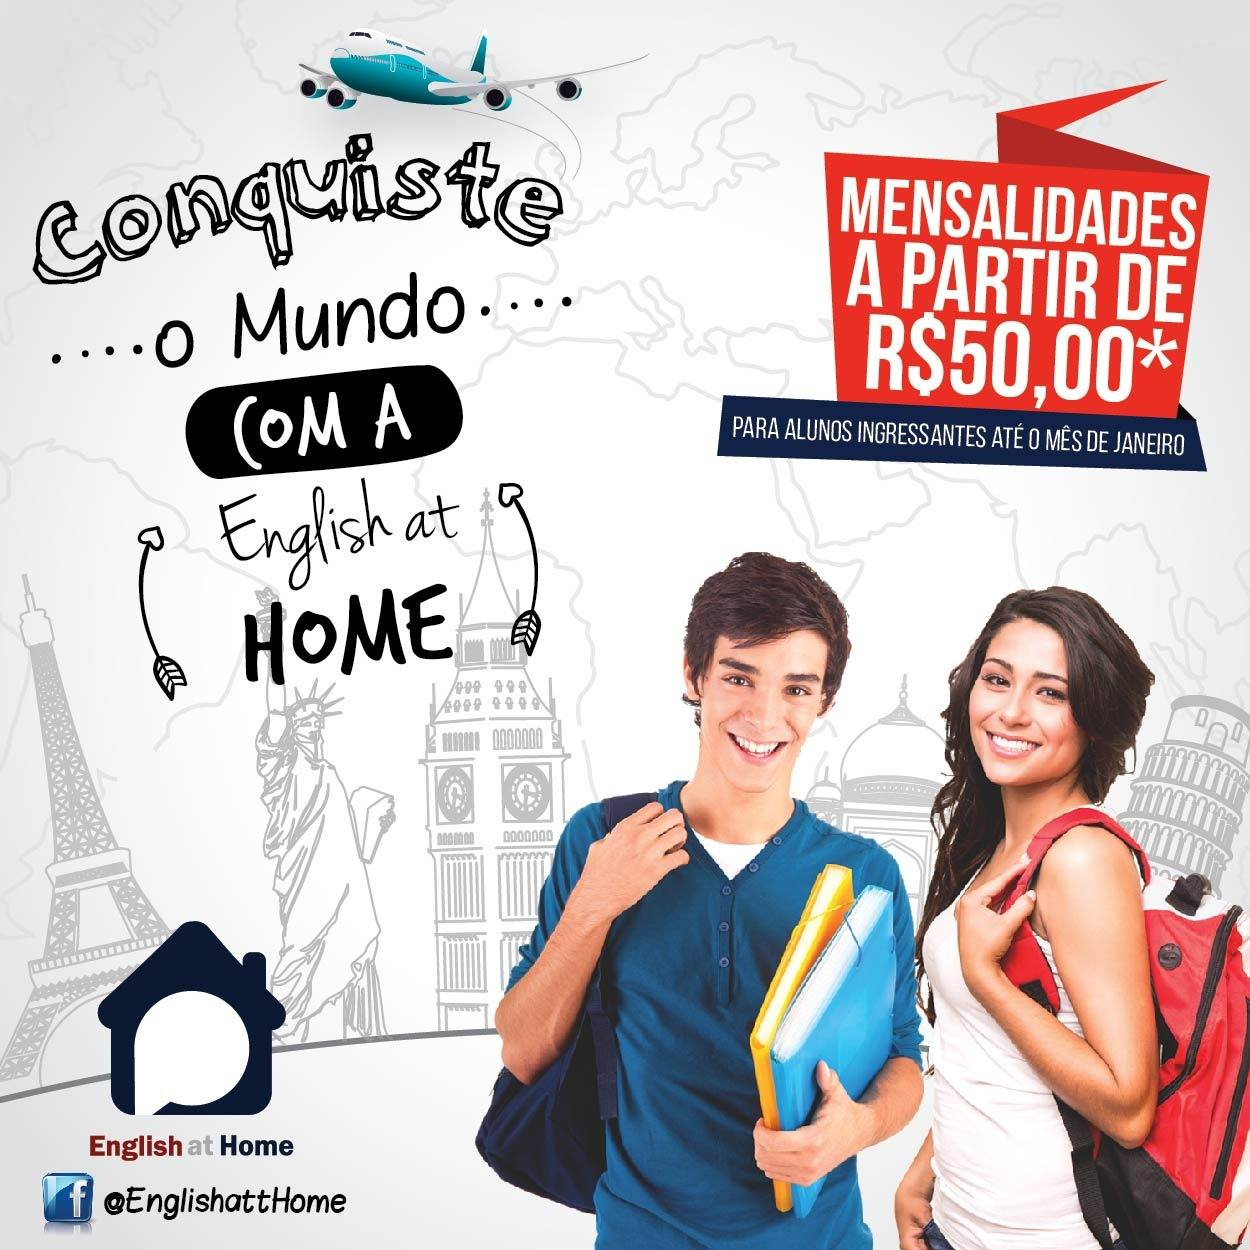 Quer aprender a falar inglês em casa?